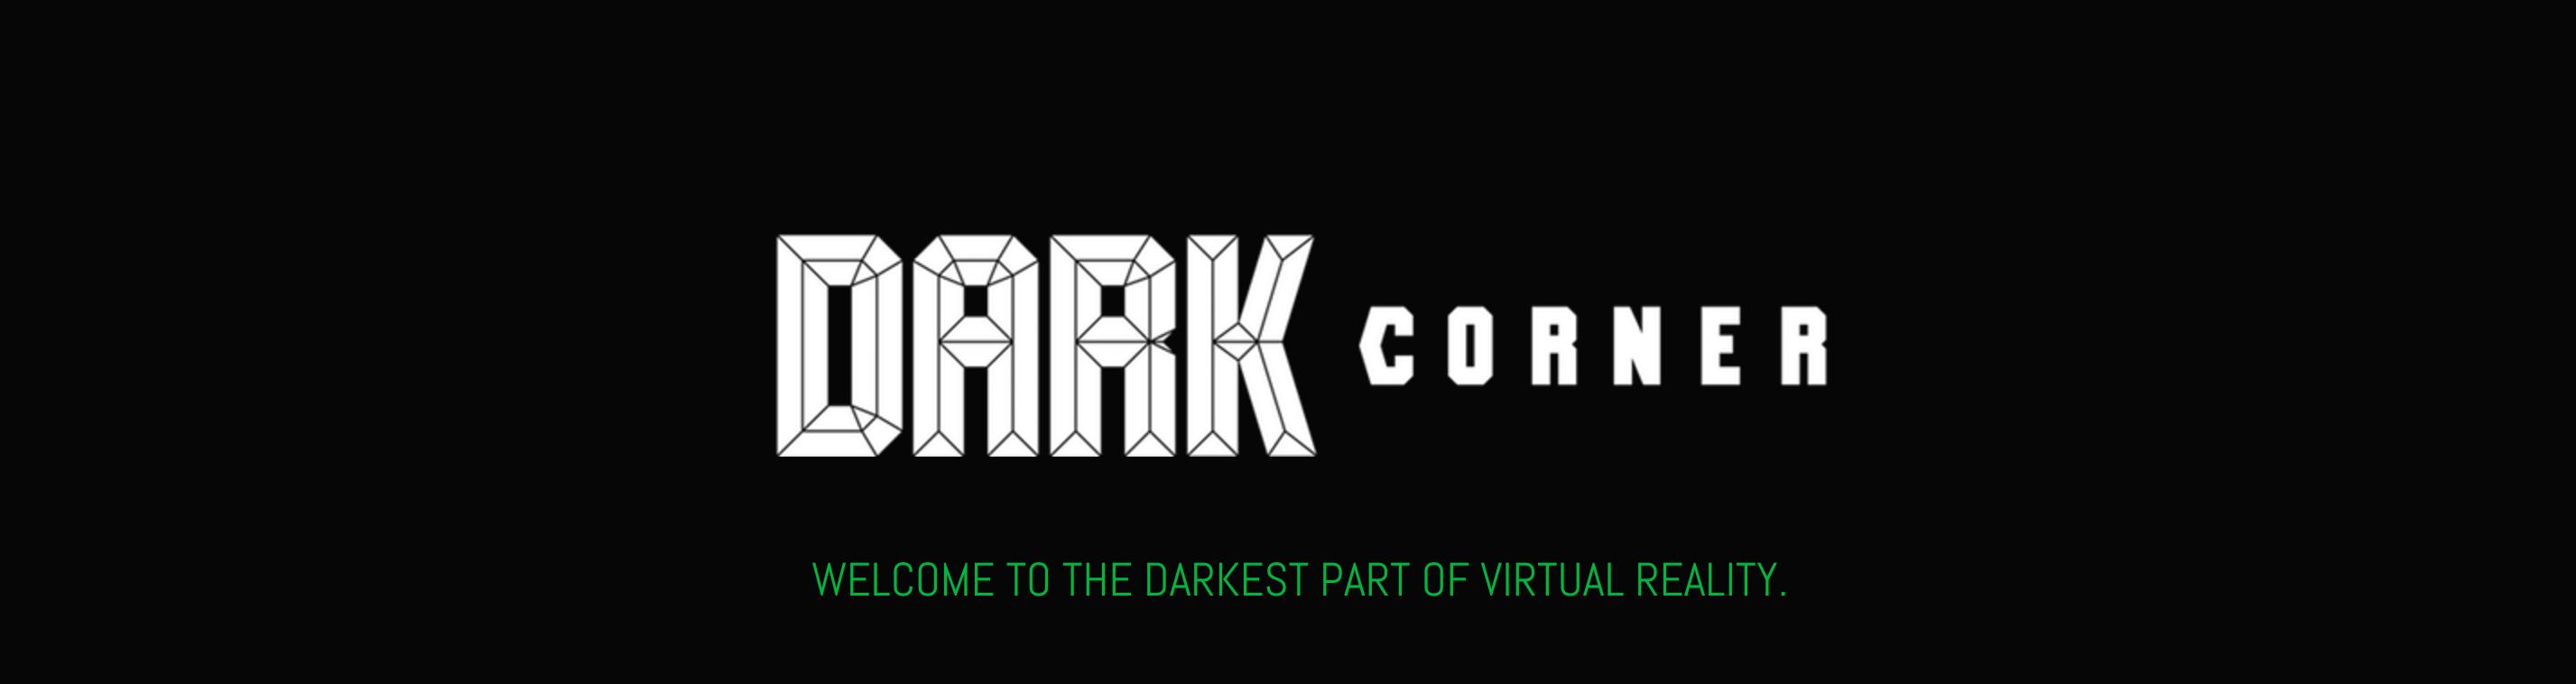 DARK CORNER VR